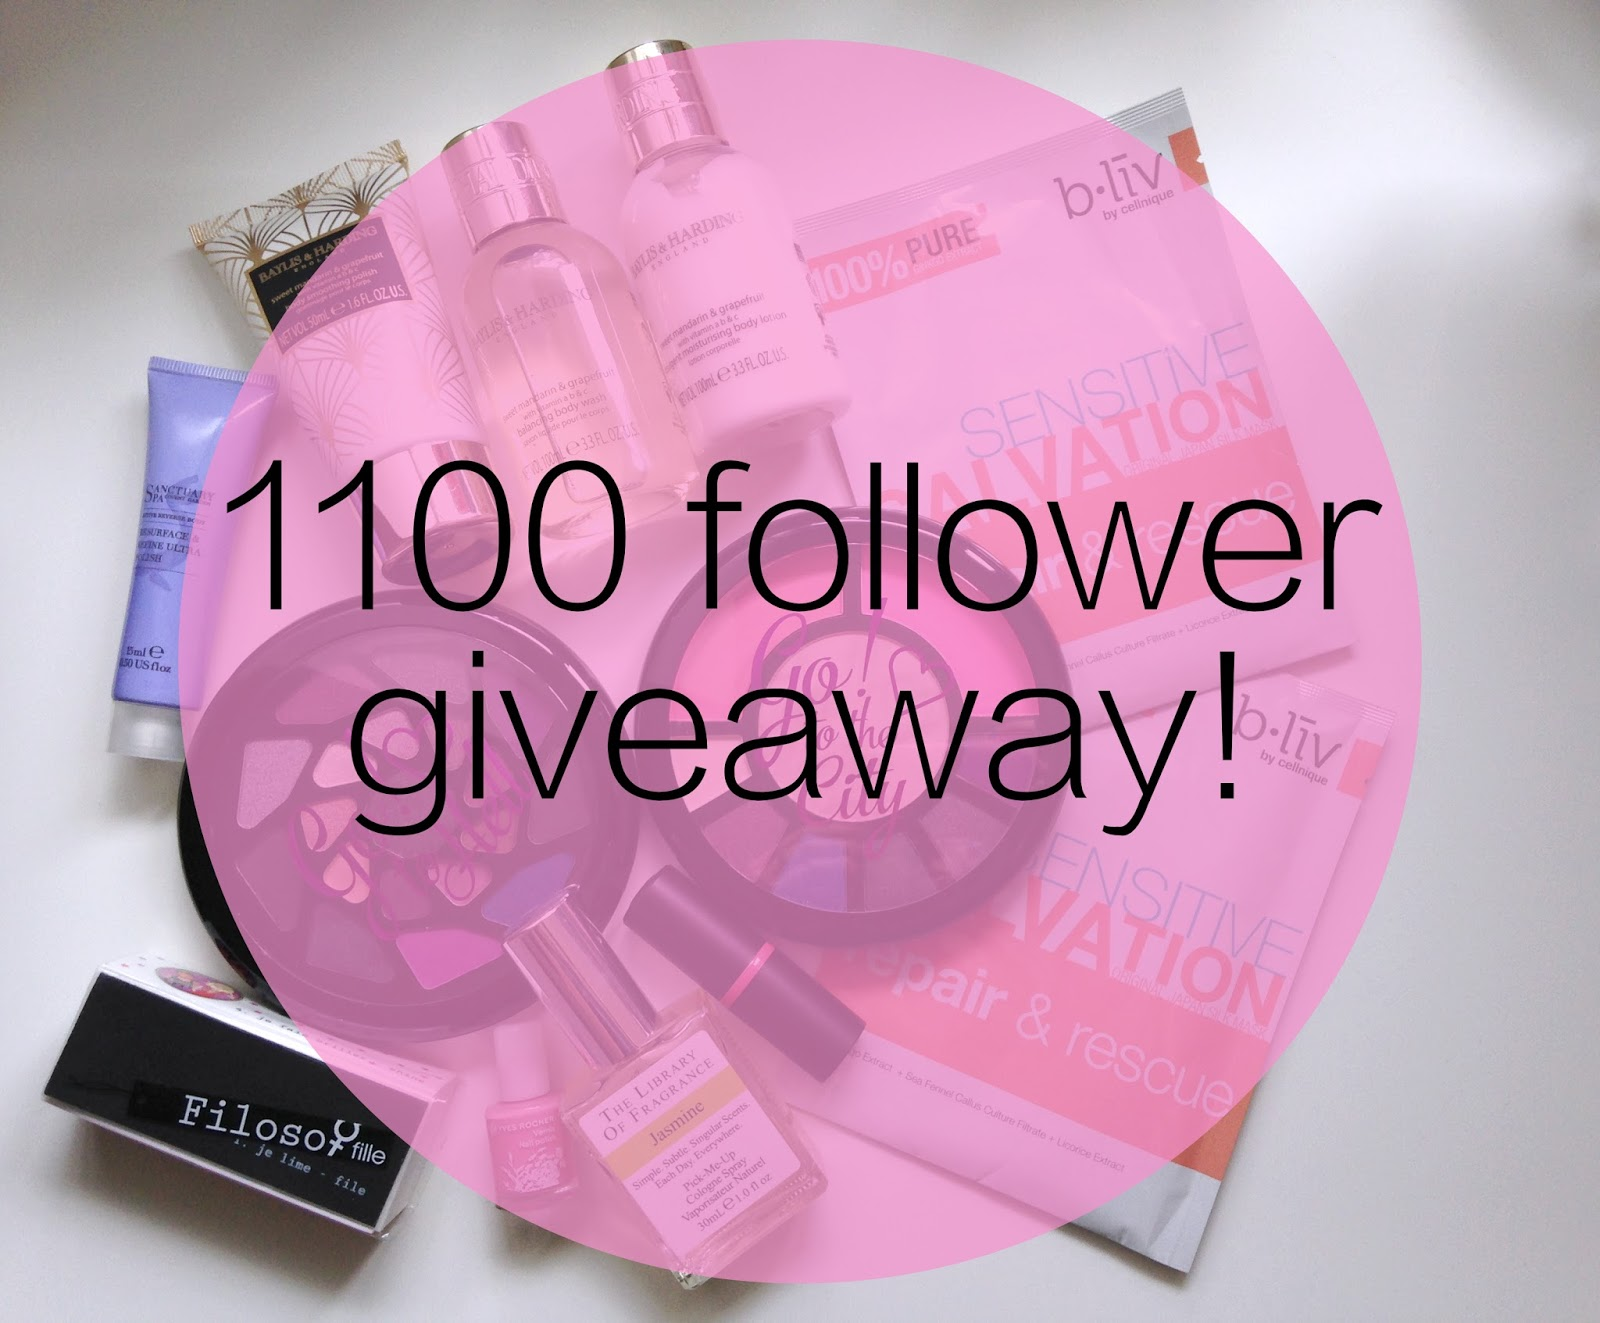 1100 follower giveaway!